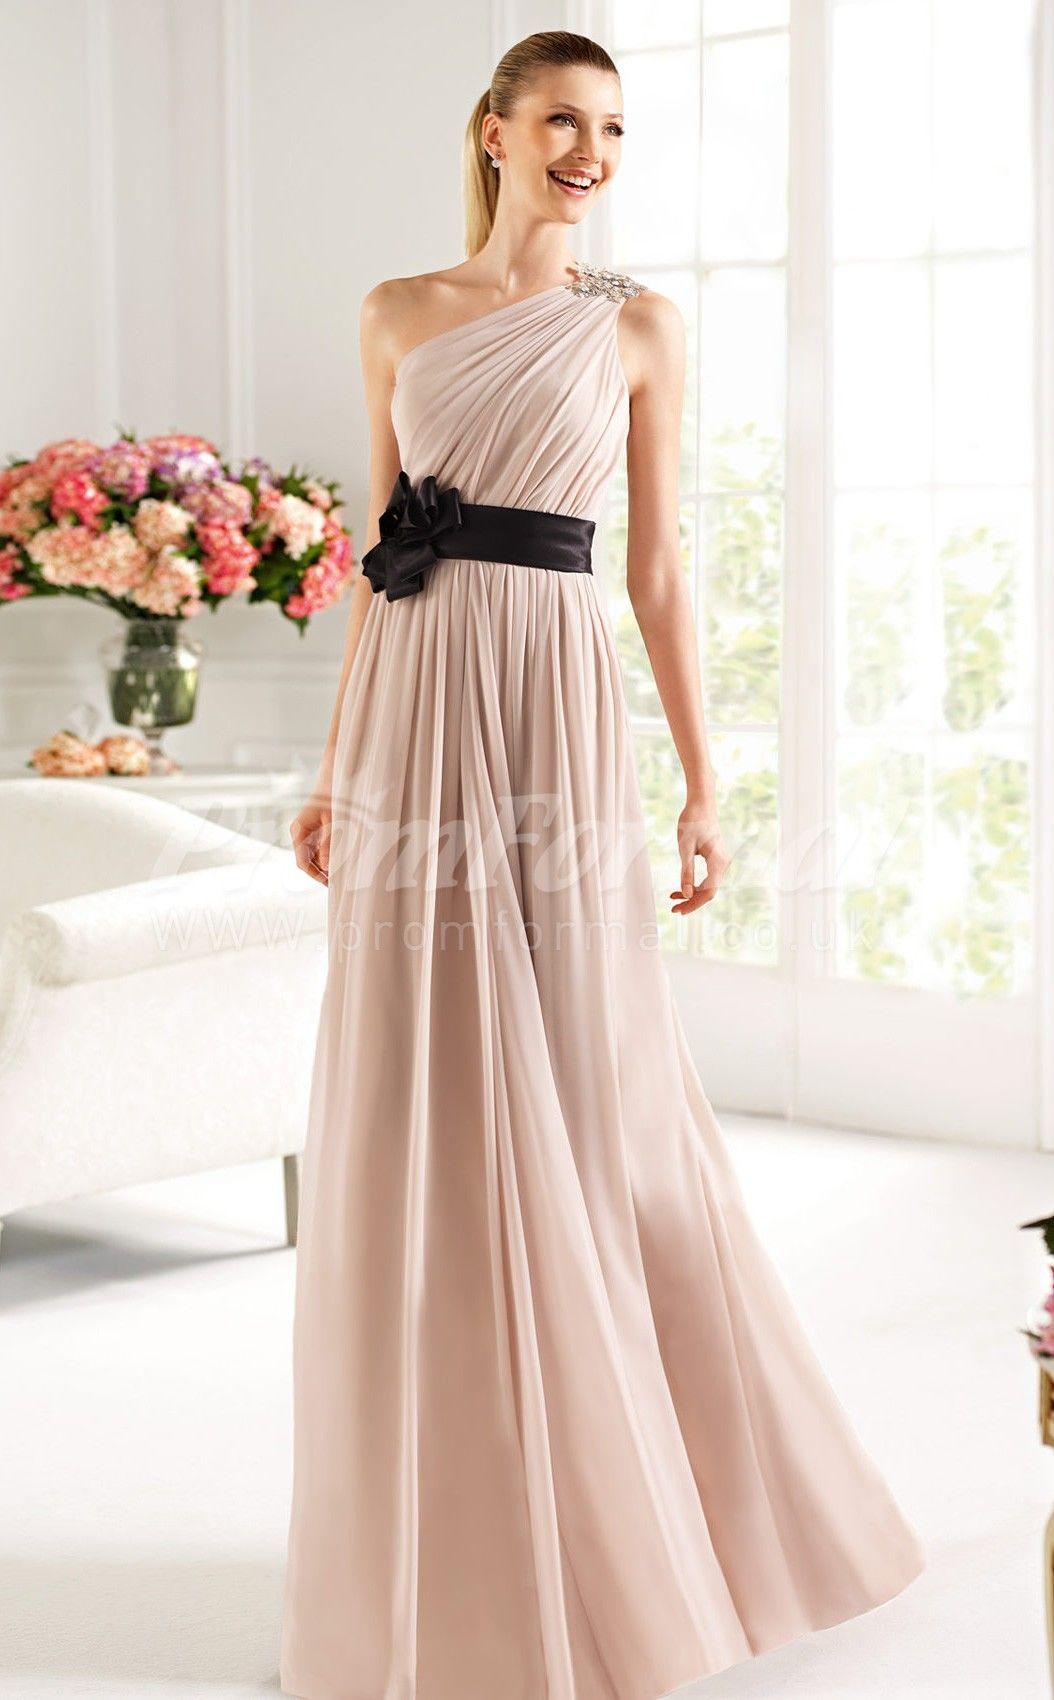 eDressit 2013 New Brown Round Neck Sleeveless Evening Dress 02131001